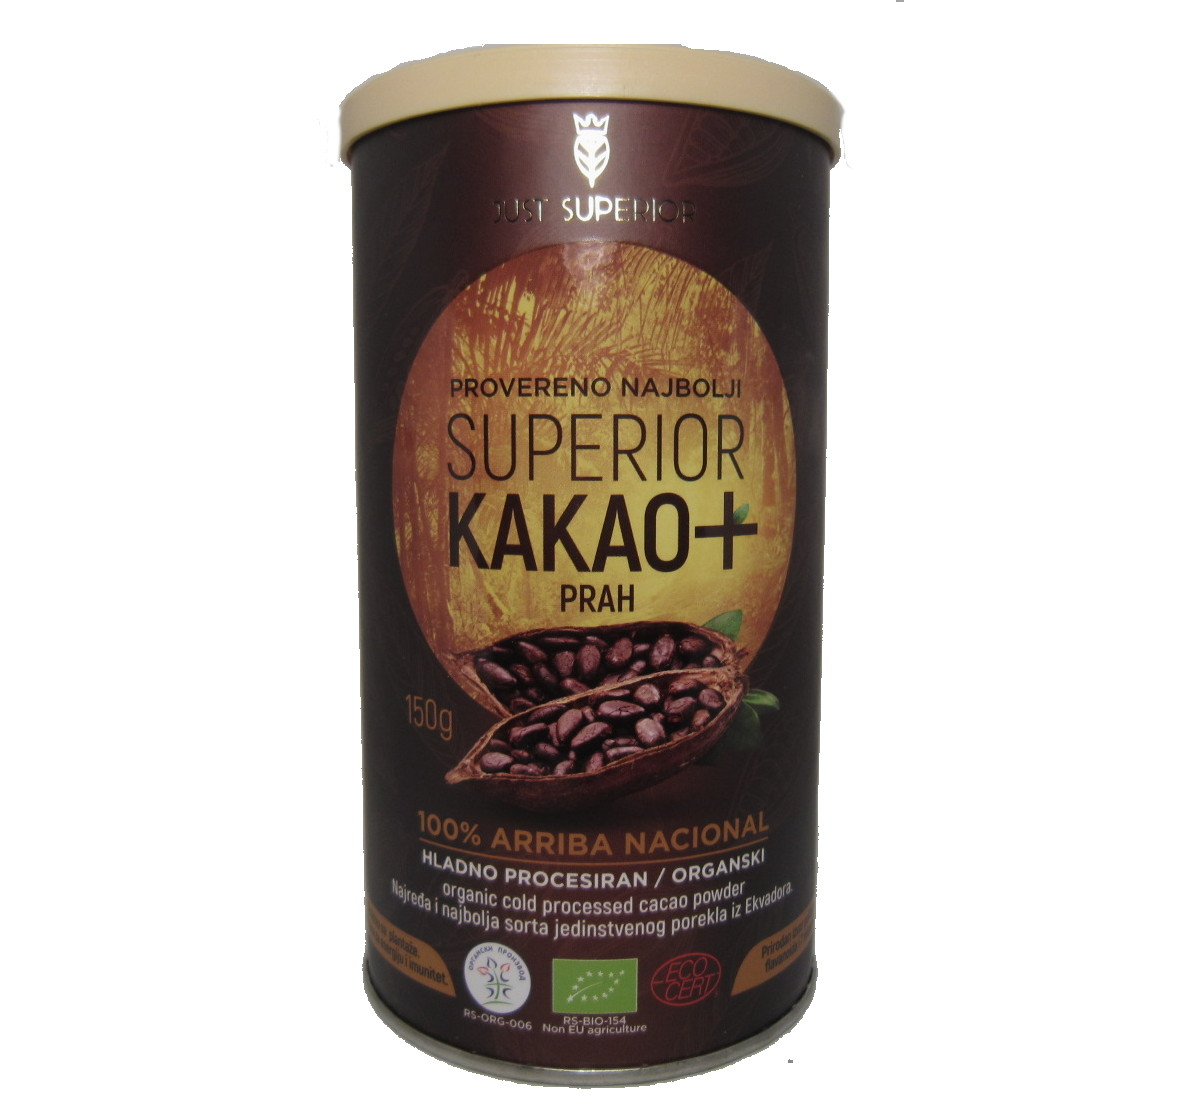 SUPERIOR, KAKAO PLUS PRAH, 150g